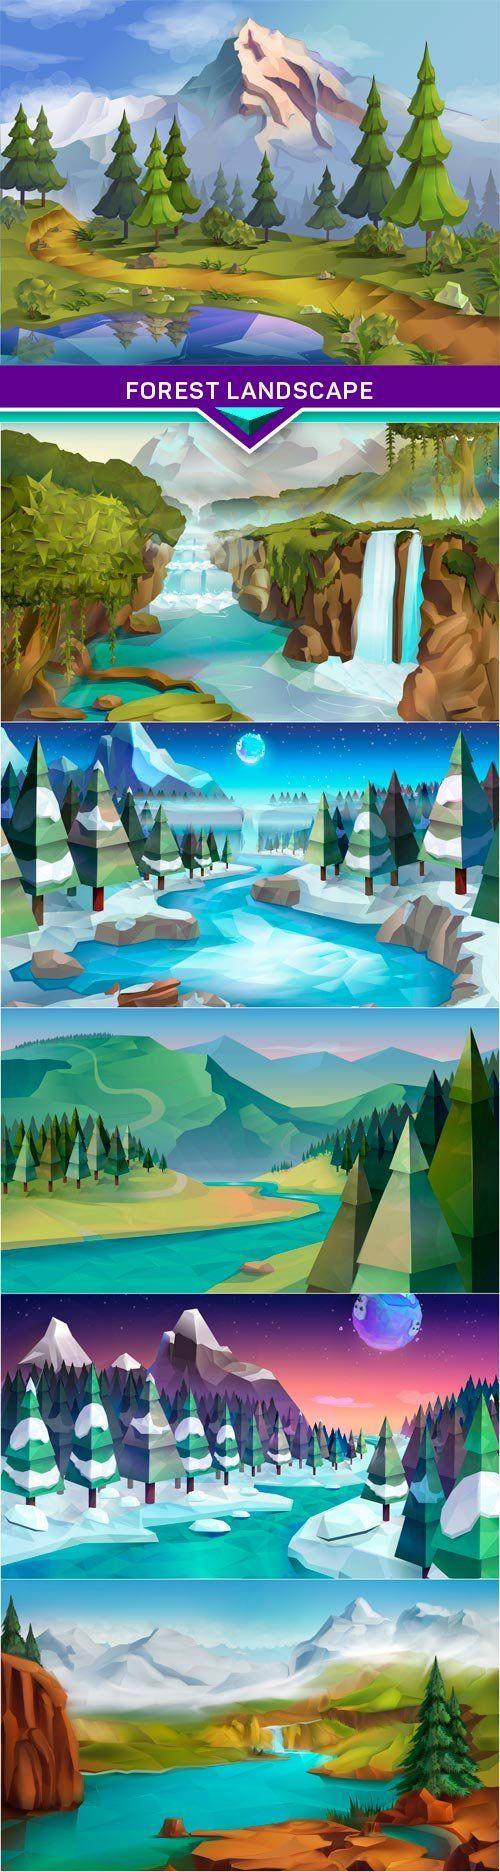 Forest landscape nature vector background 6x EPS